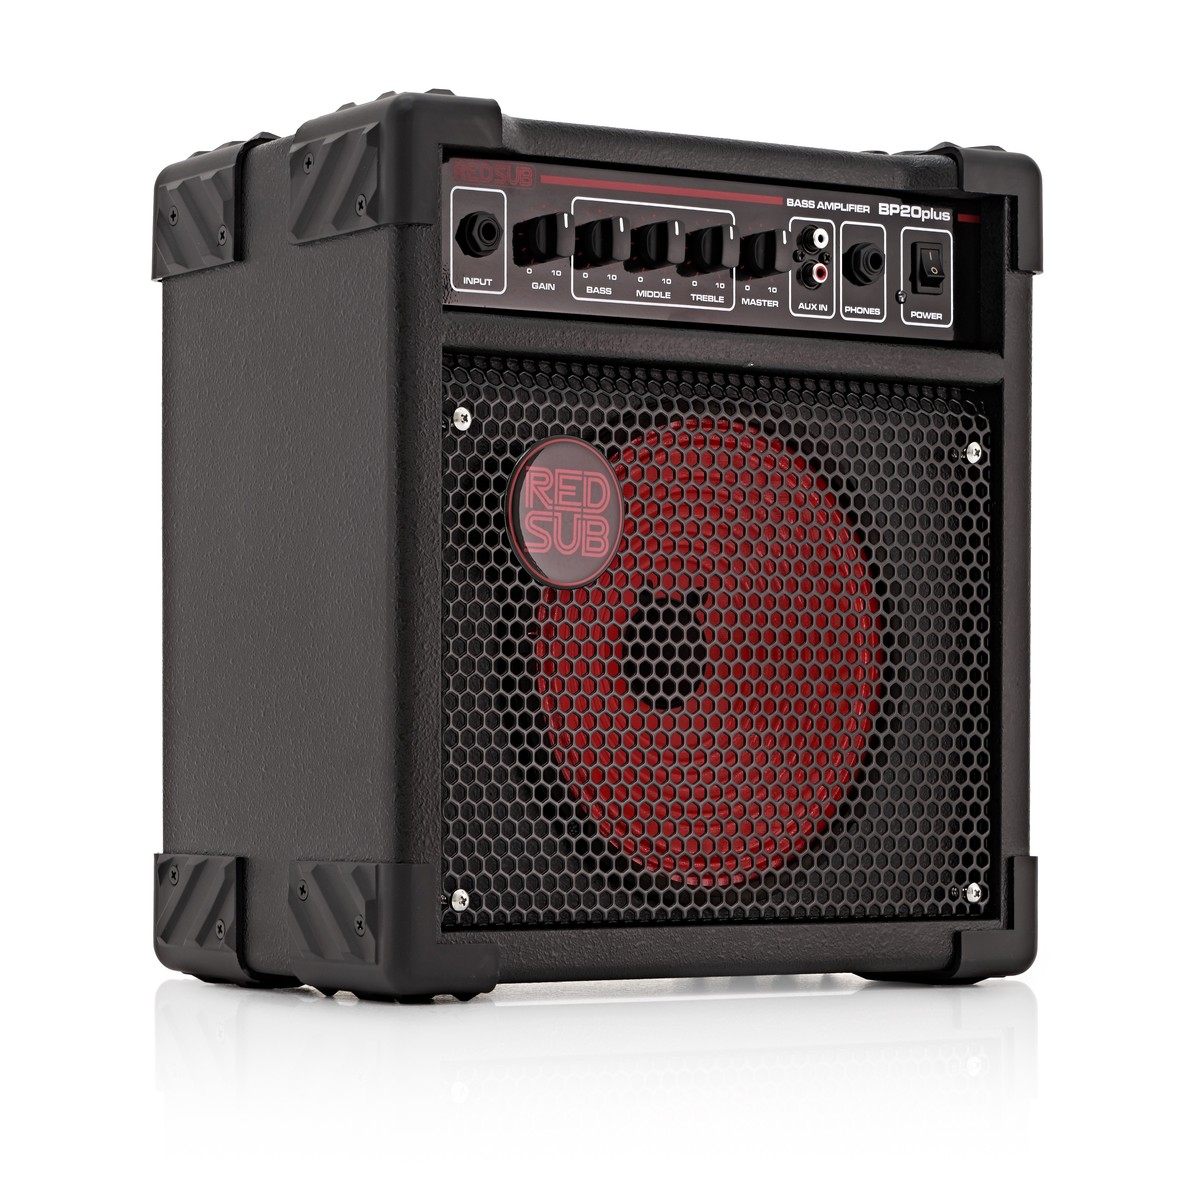 redsub bp20plus 20w bass guitar amplifier at gear4music. Black Bedroom Furniture Sets. Home Design Ideas